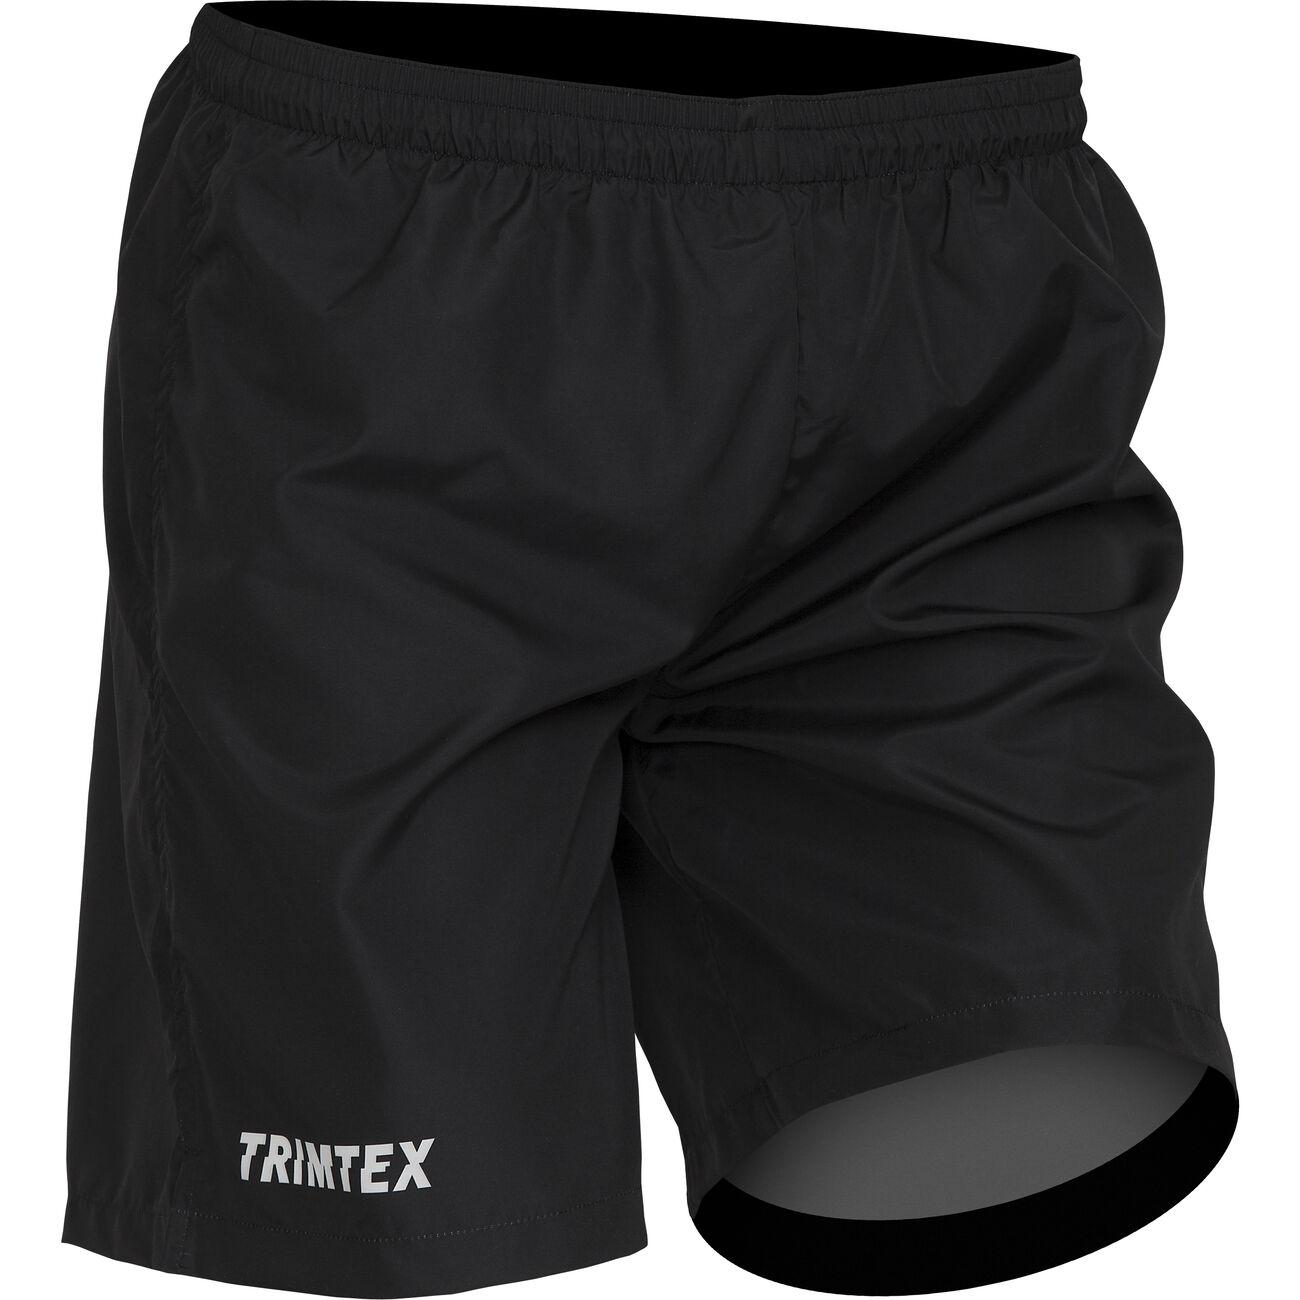 Free shorts junior